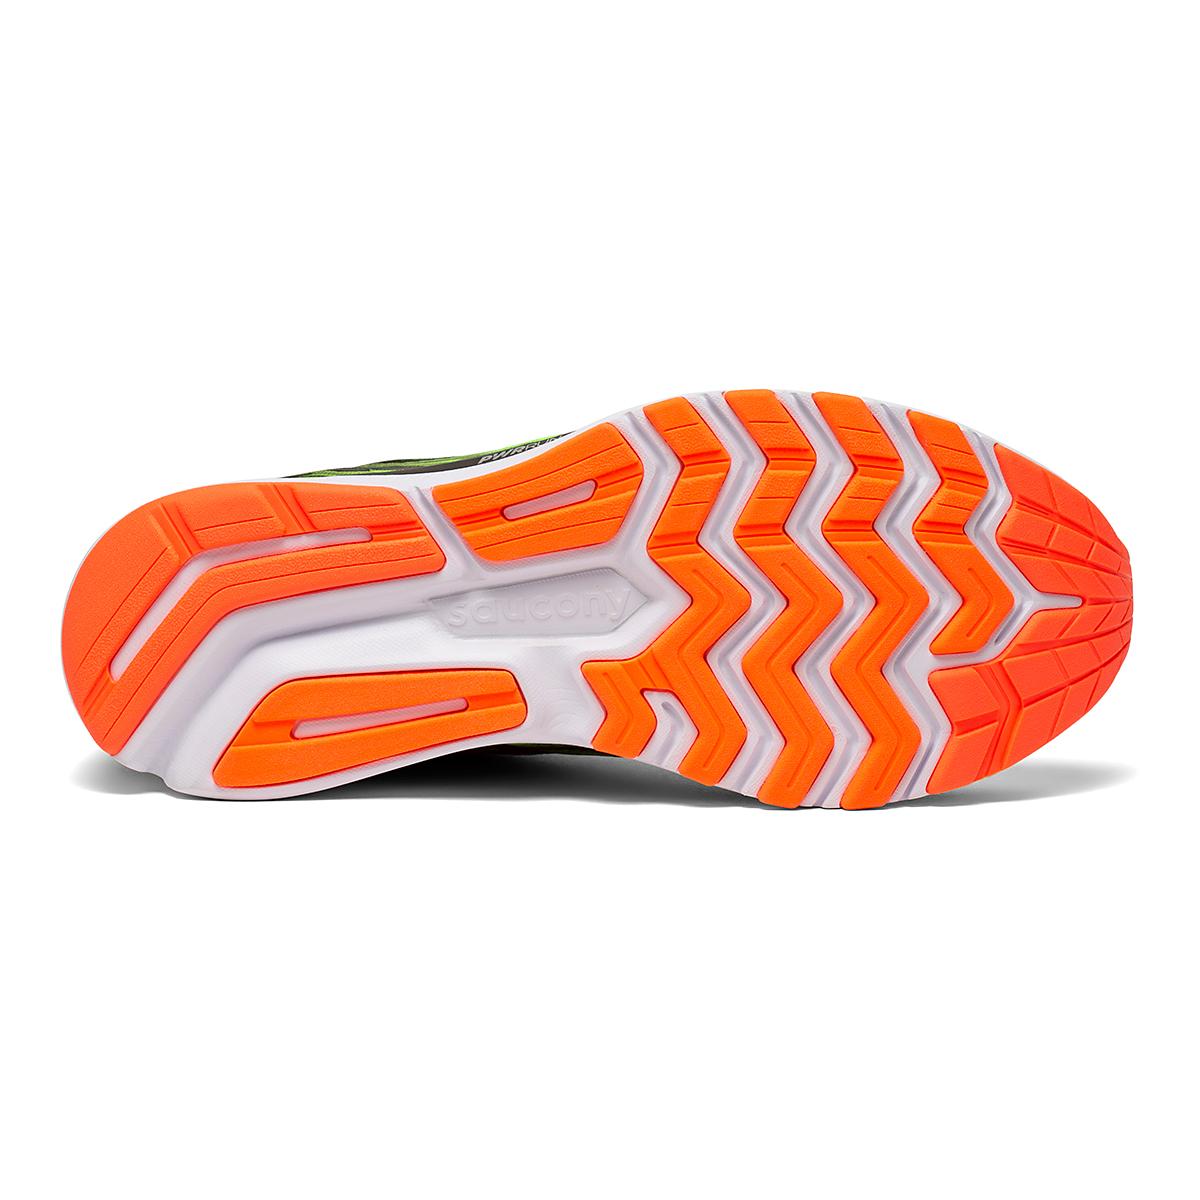 Men's Saucony Ride 14 Running Shoe - Color: Vizipro - Size: 7 - Width: Regular, Vizipro, large, image 4